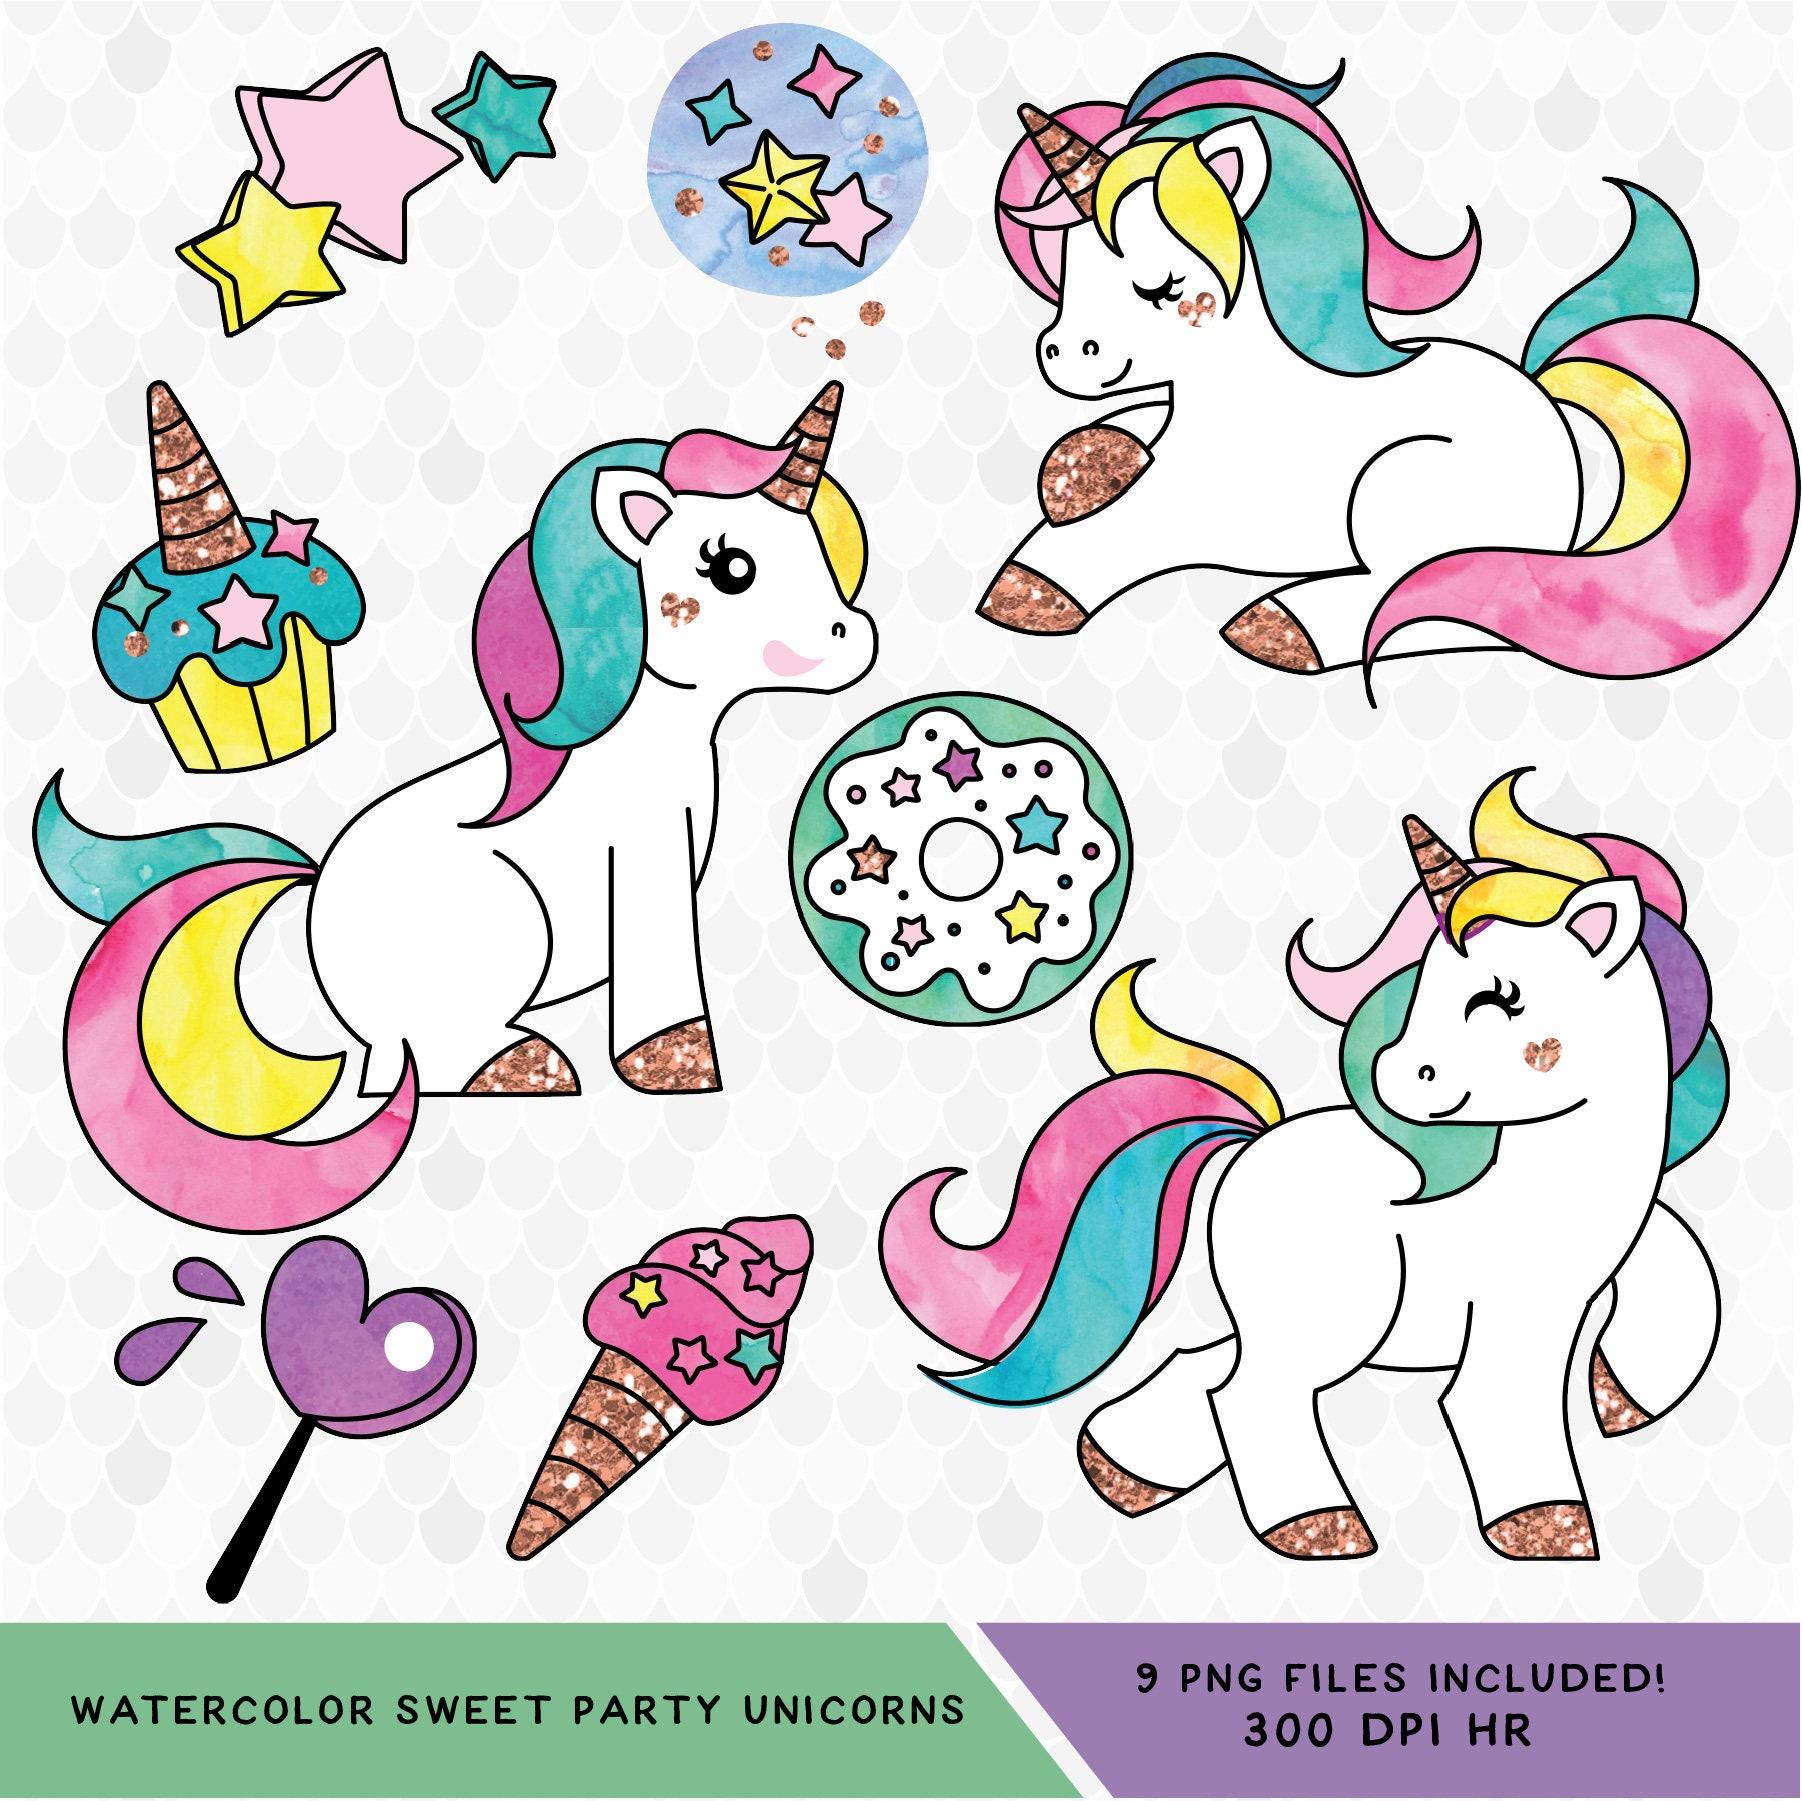 kawaii unicorn clipart  unicorn clipart  watercolor clipart  kawaii clipart  unicorn party fairytale clipart border free fairytale clipart border free